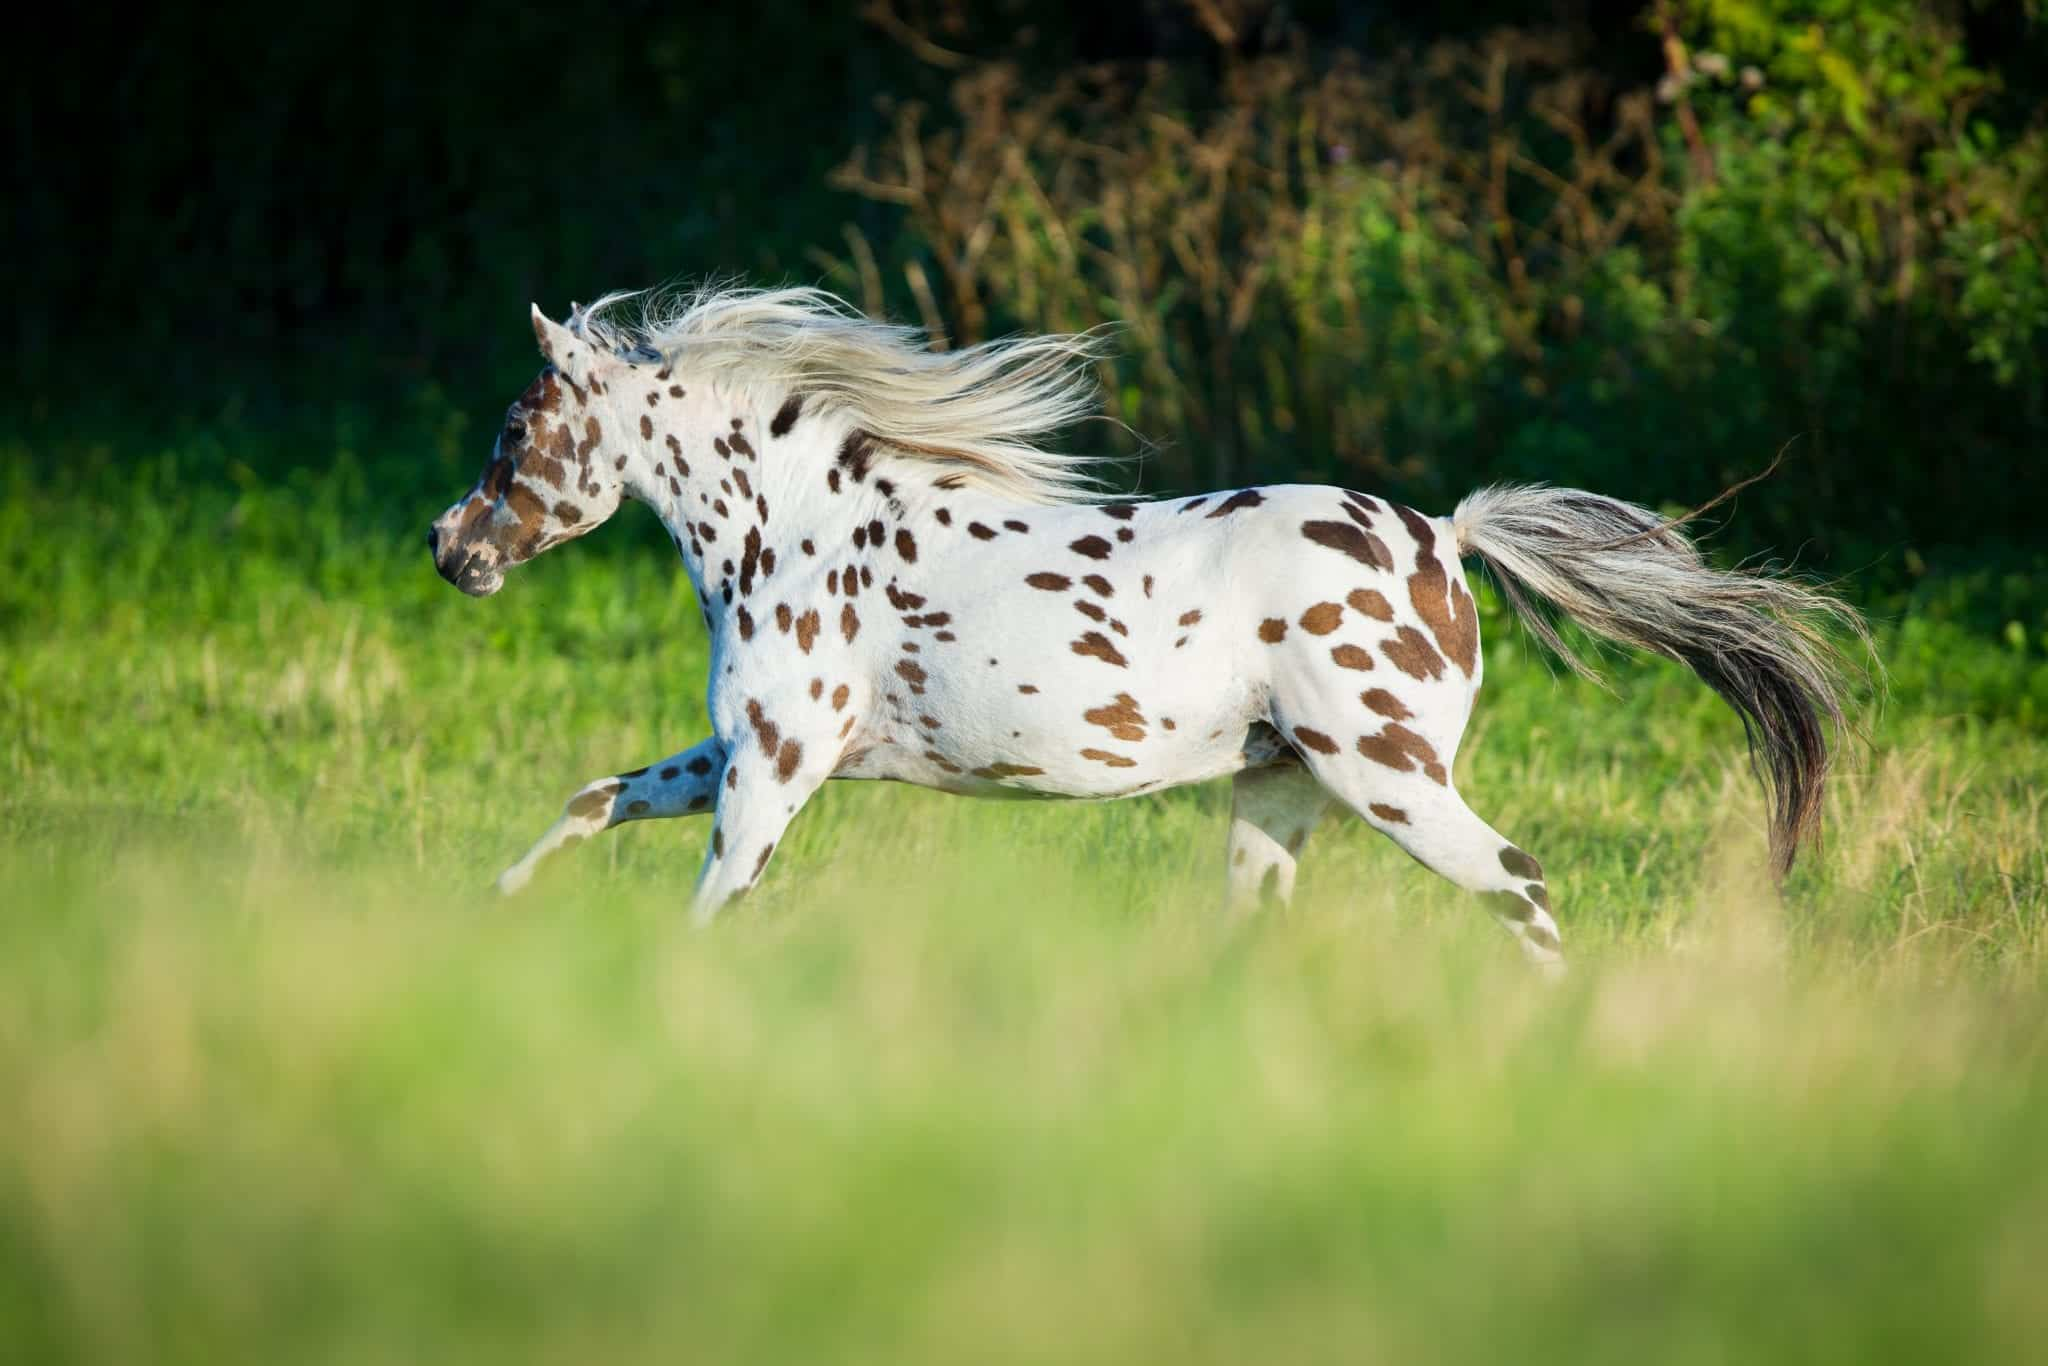 Appaloosa horse running in field in summer